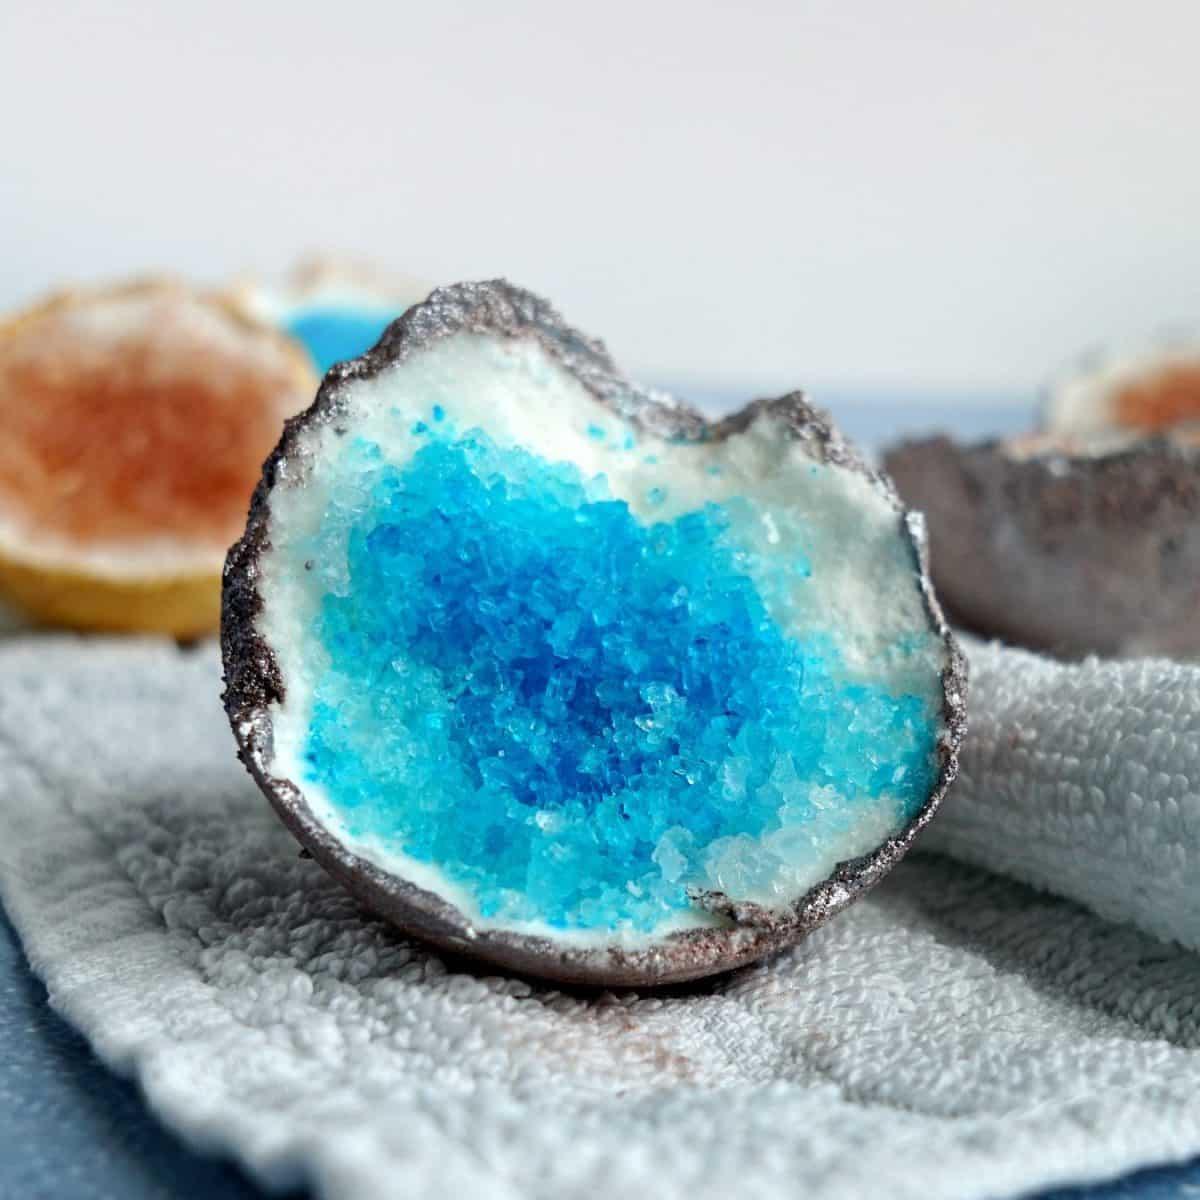 Geode Bath Bombs – THE ORIGINAL DIY RECIPE